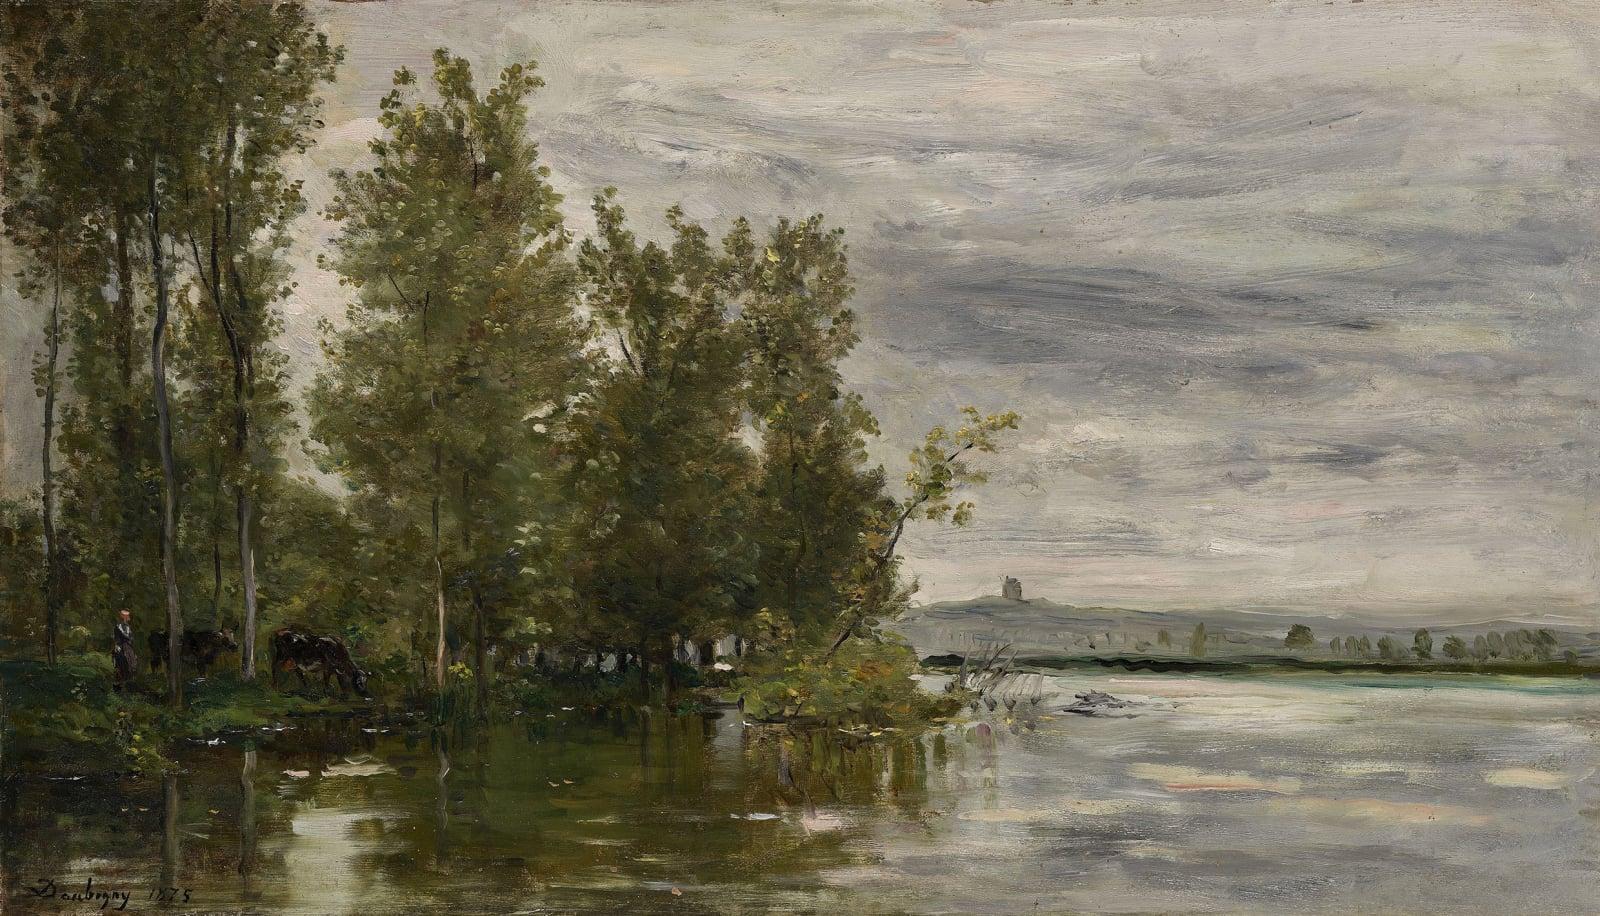 Charles François Daubigny, L'Inondation, 1875